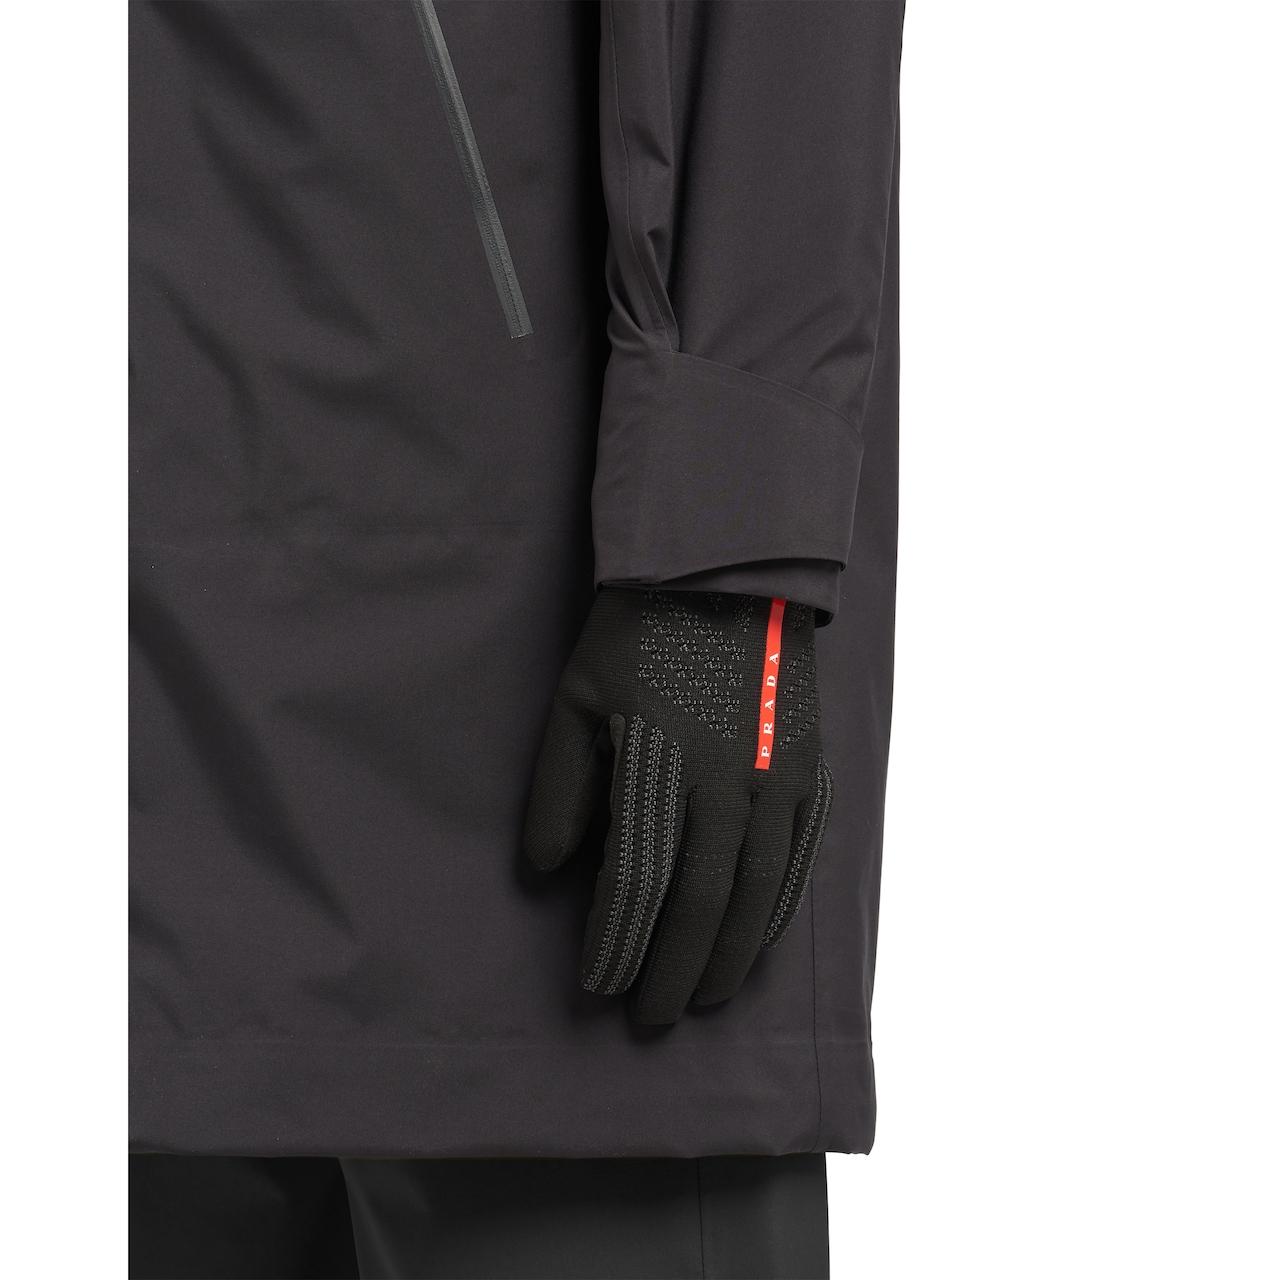 Prada Fabric gloves 2